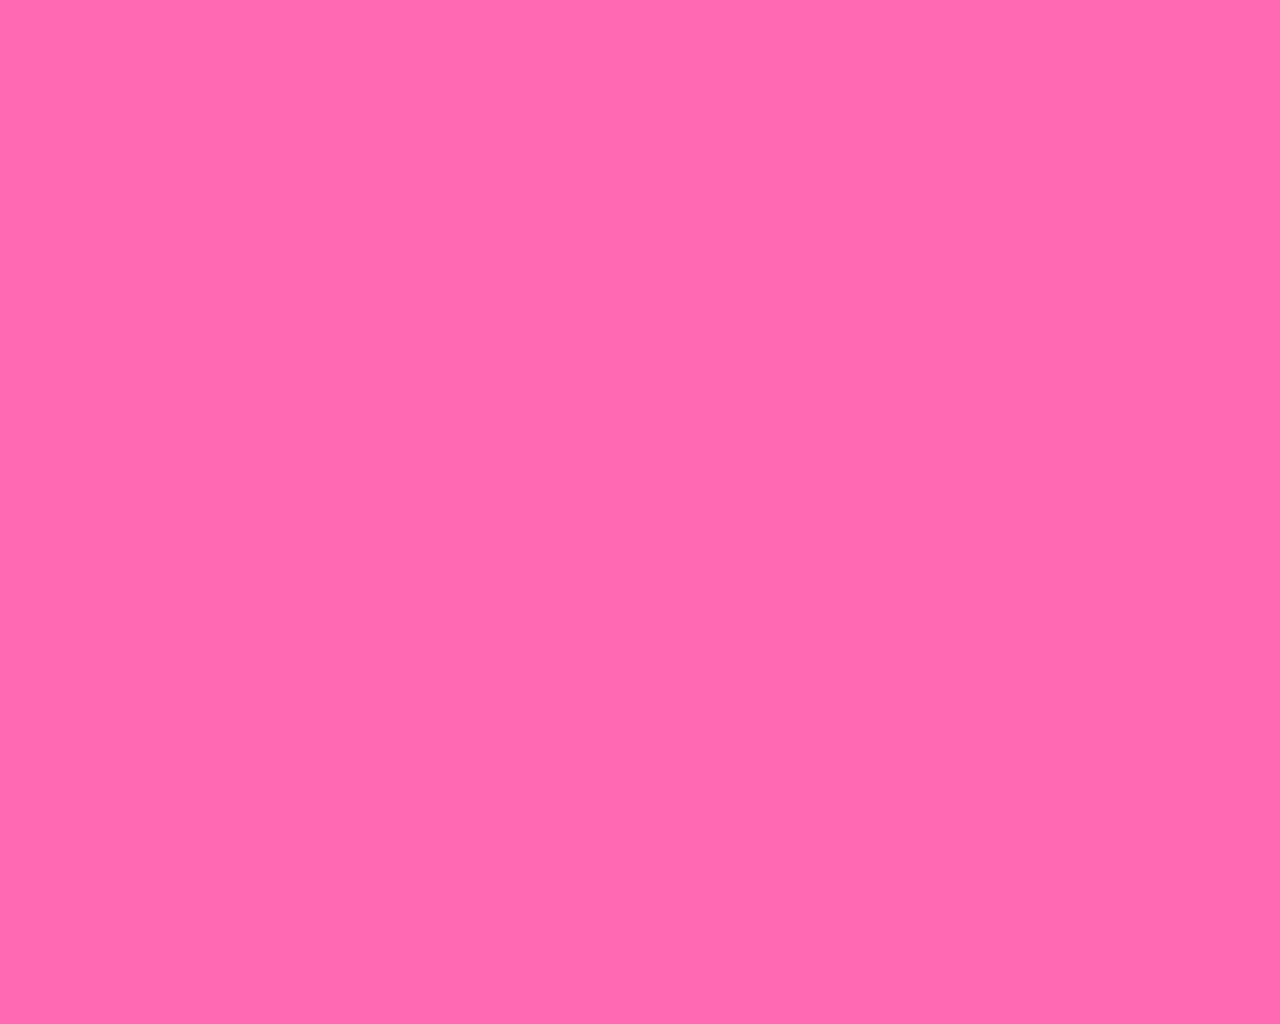 [75+] Bright Pink Back...